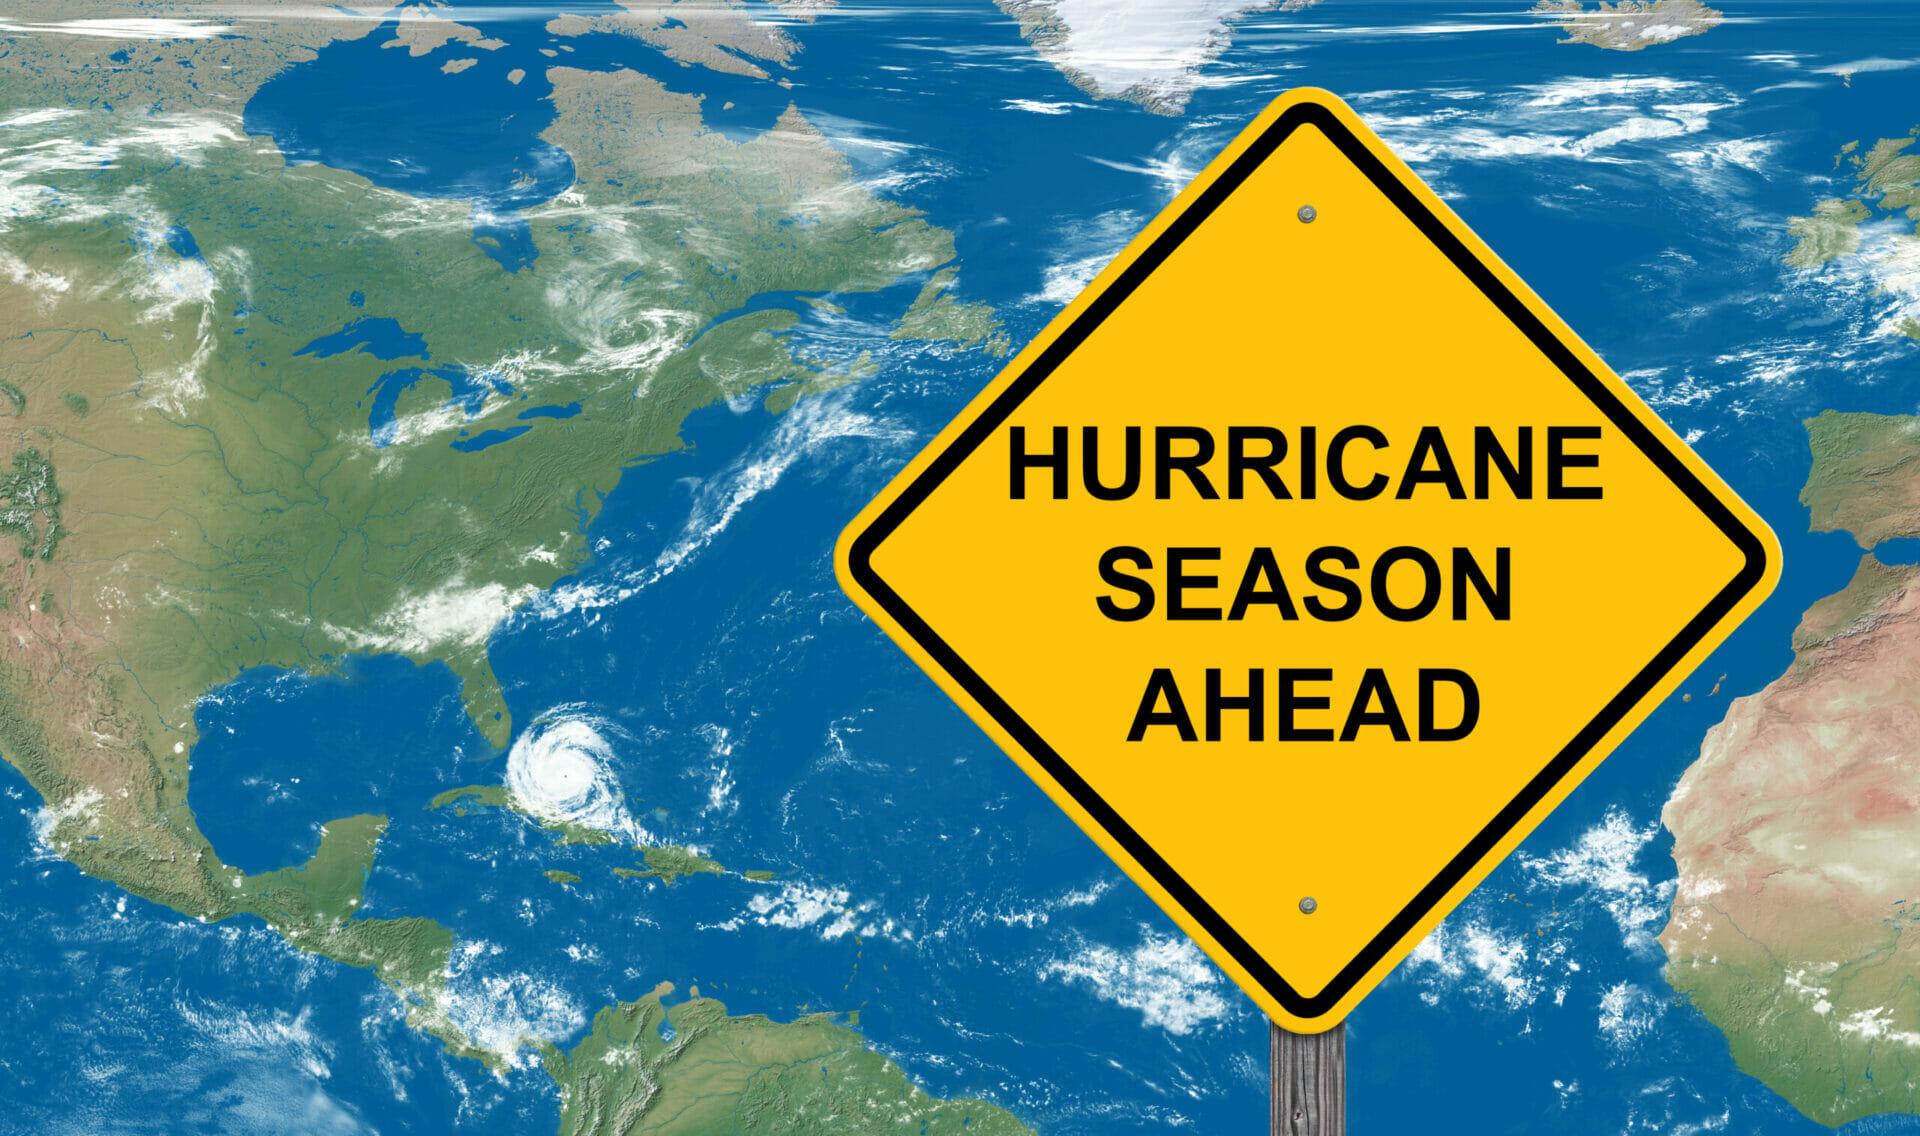 Hurricane Season Warning Sign